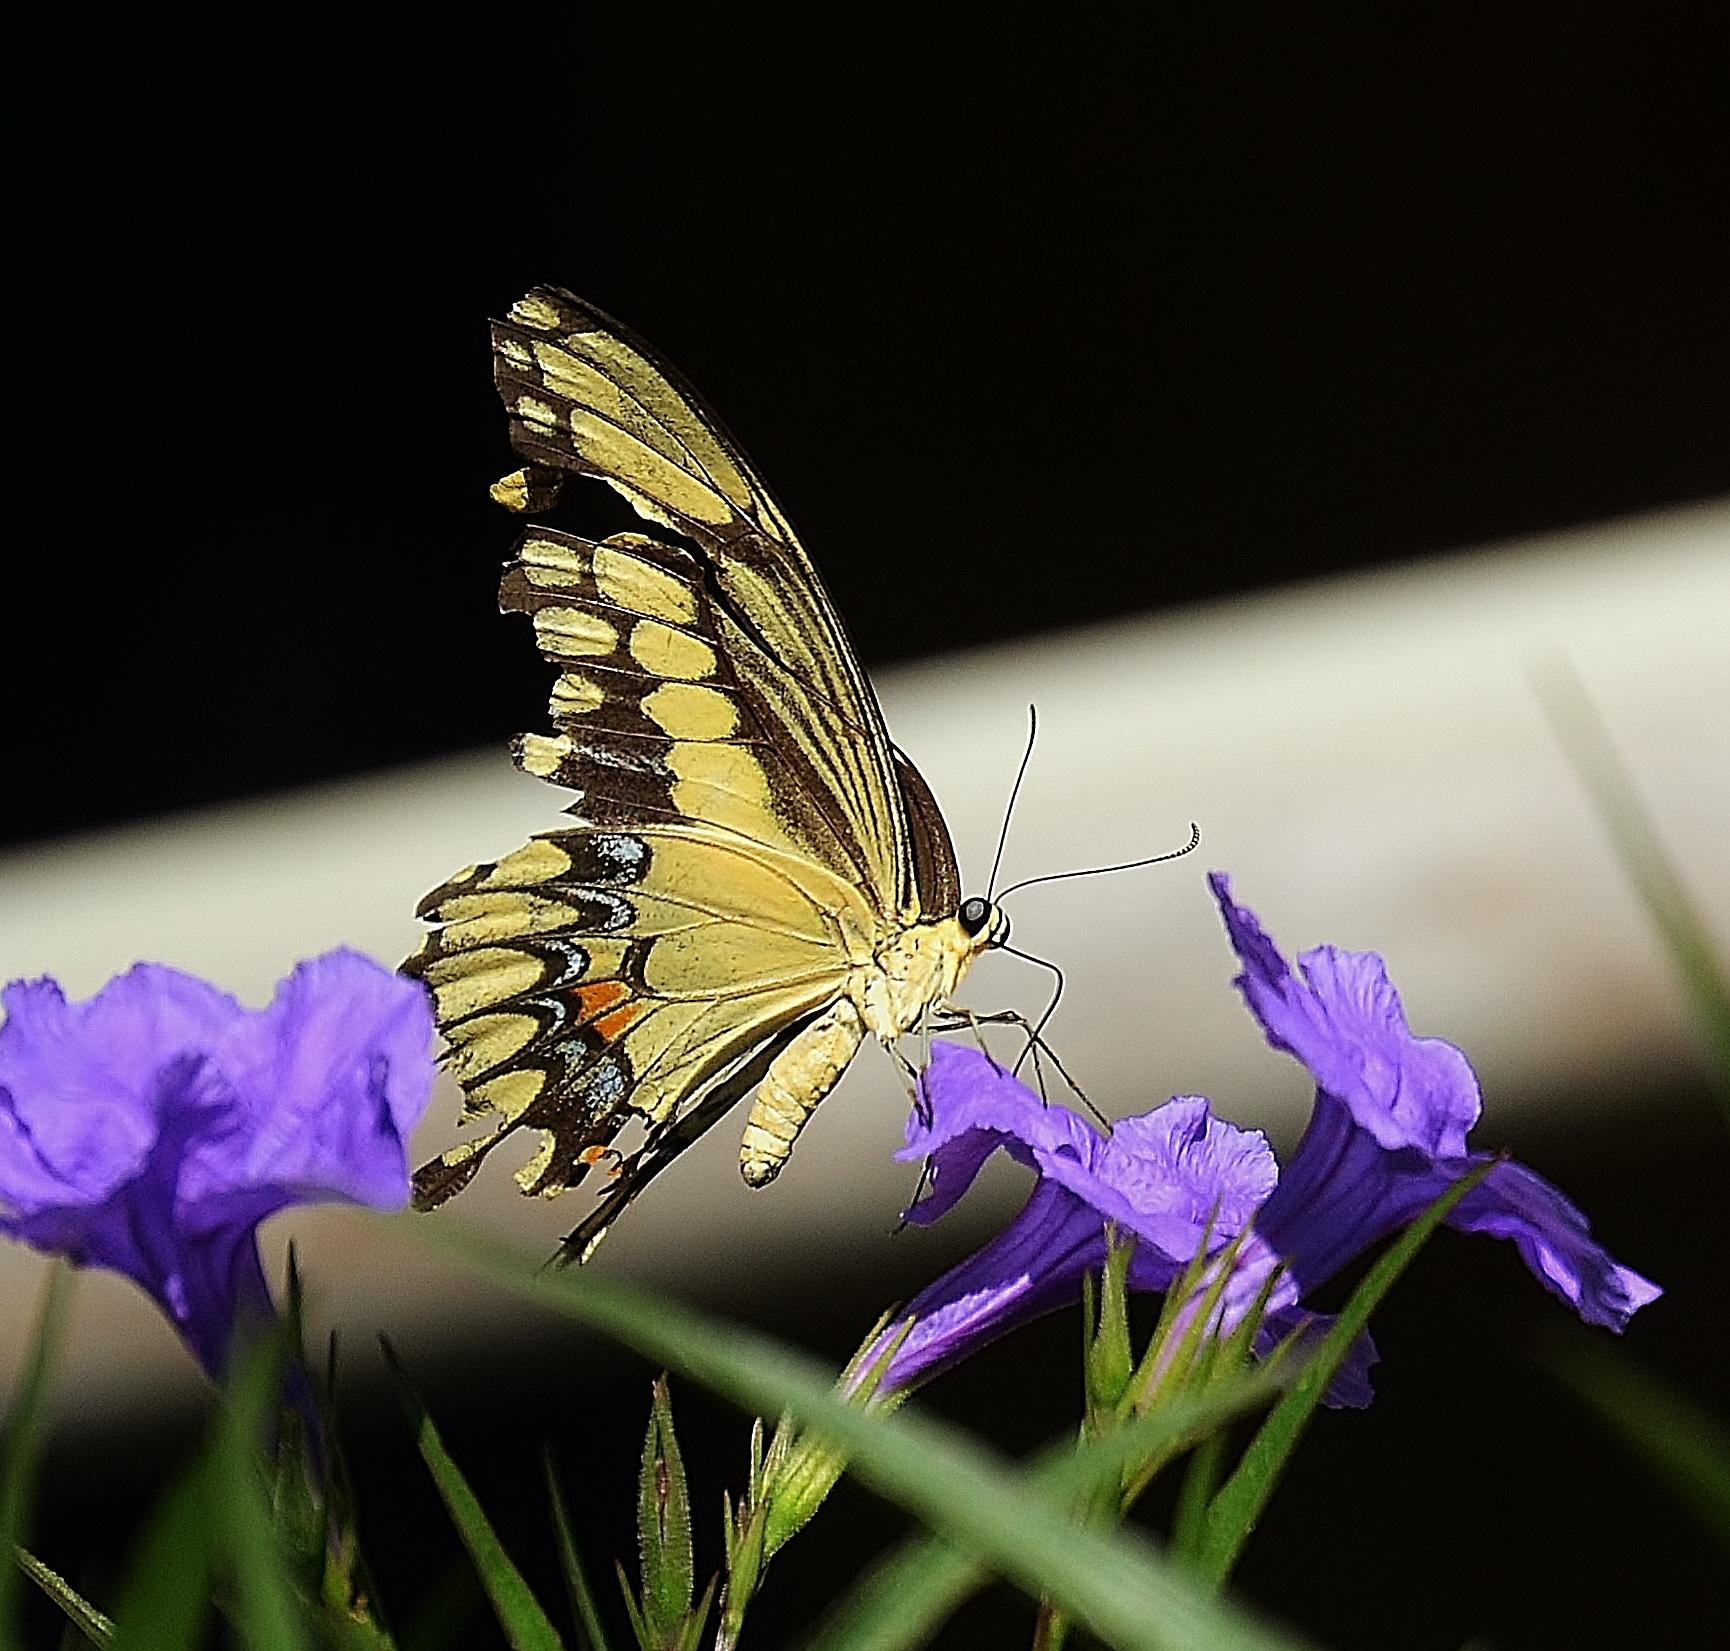 Getting Nectar